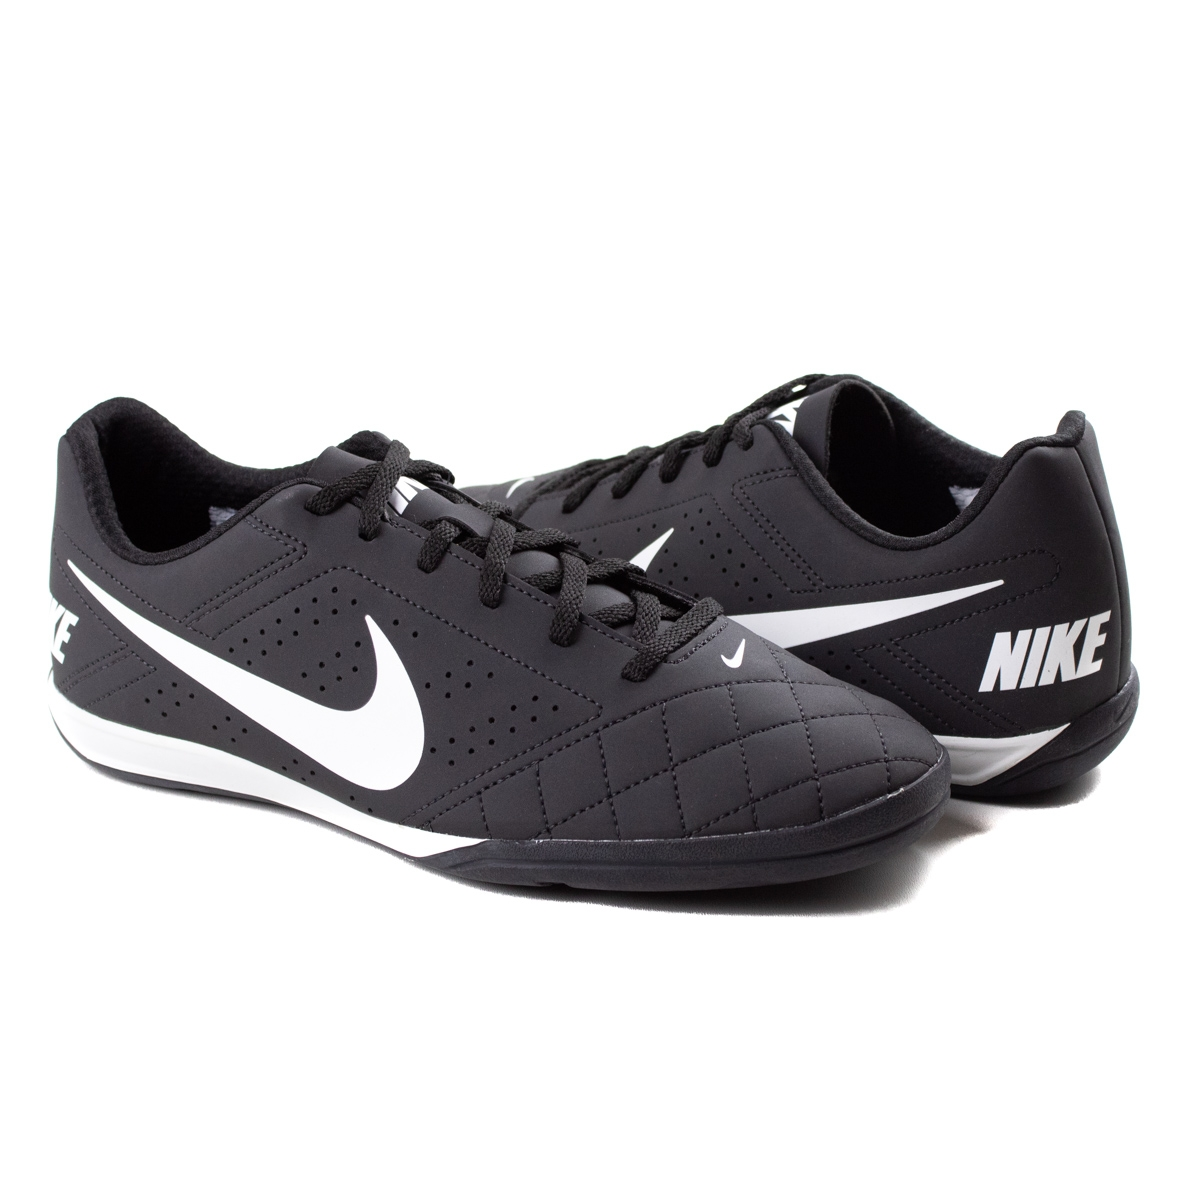 Tênis Indoor Beco 2 Nike - Bl/wh-cool grey-gum bro